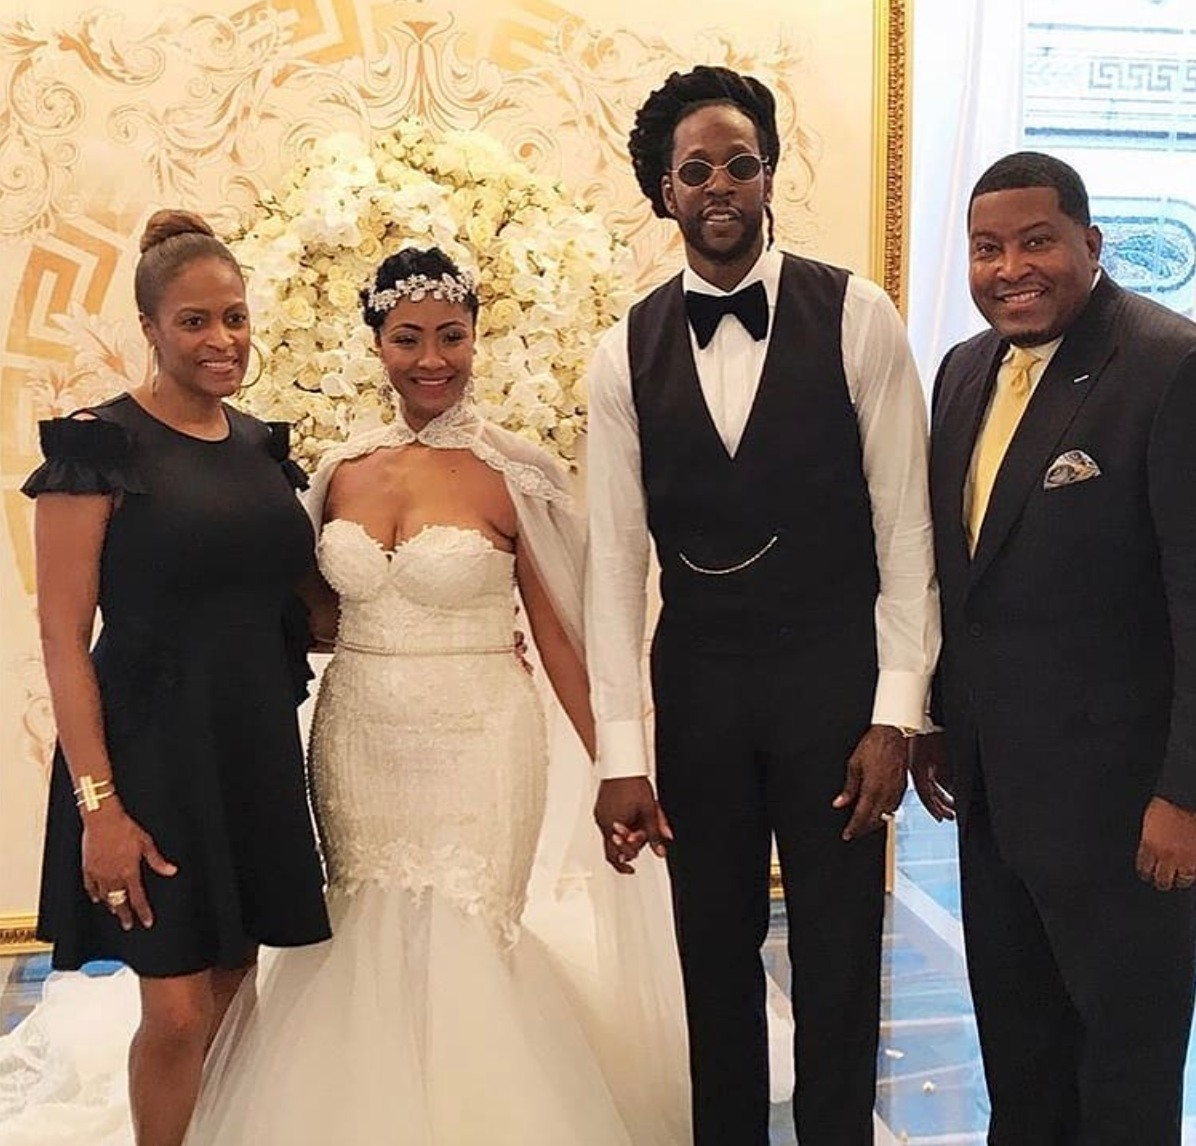 2 Chainz Marries Longtime Girlfriend Kesha In Miami Photos 5